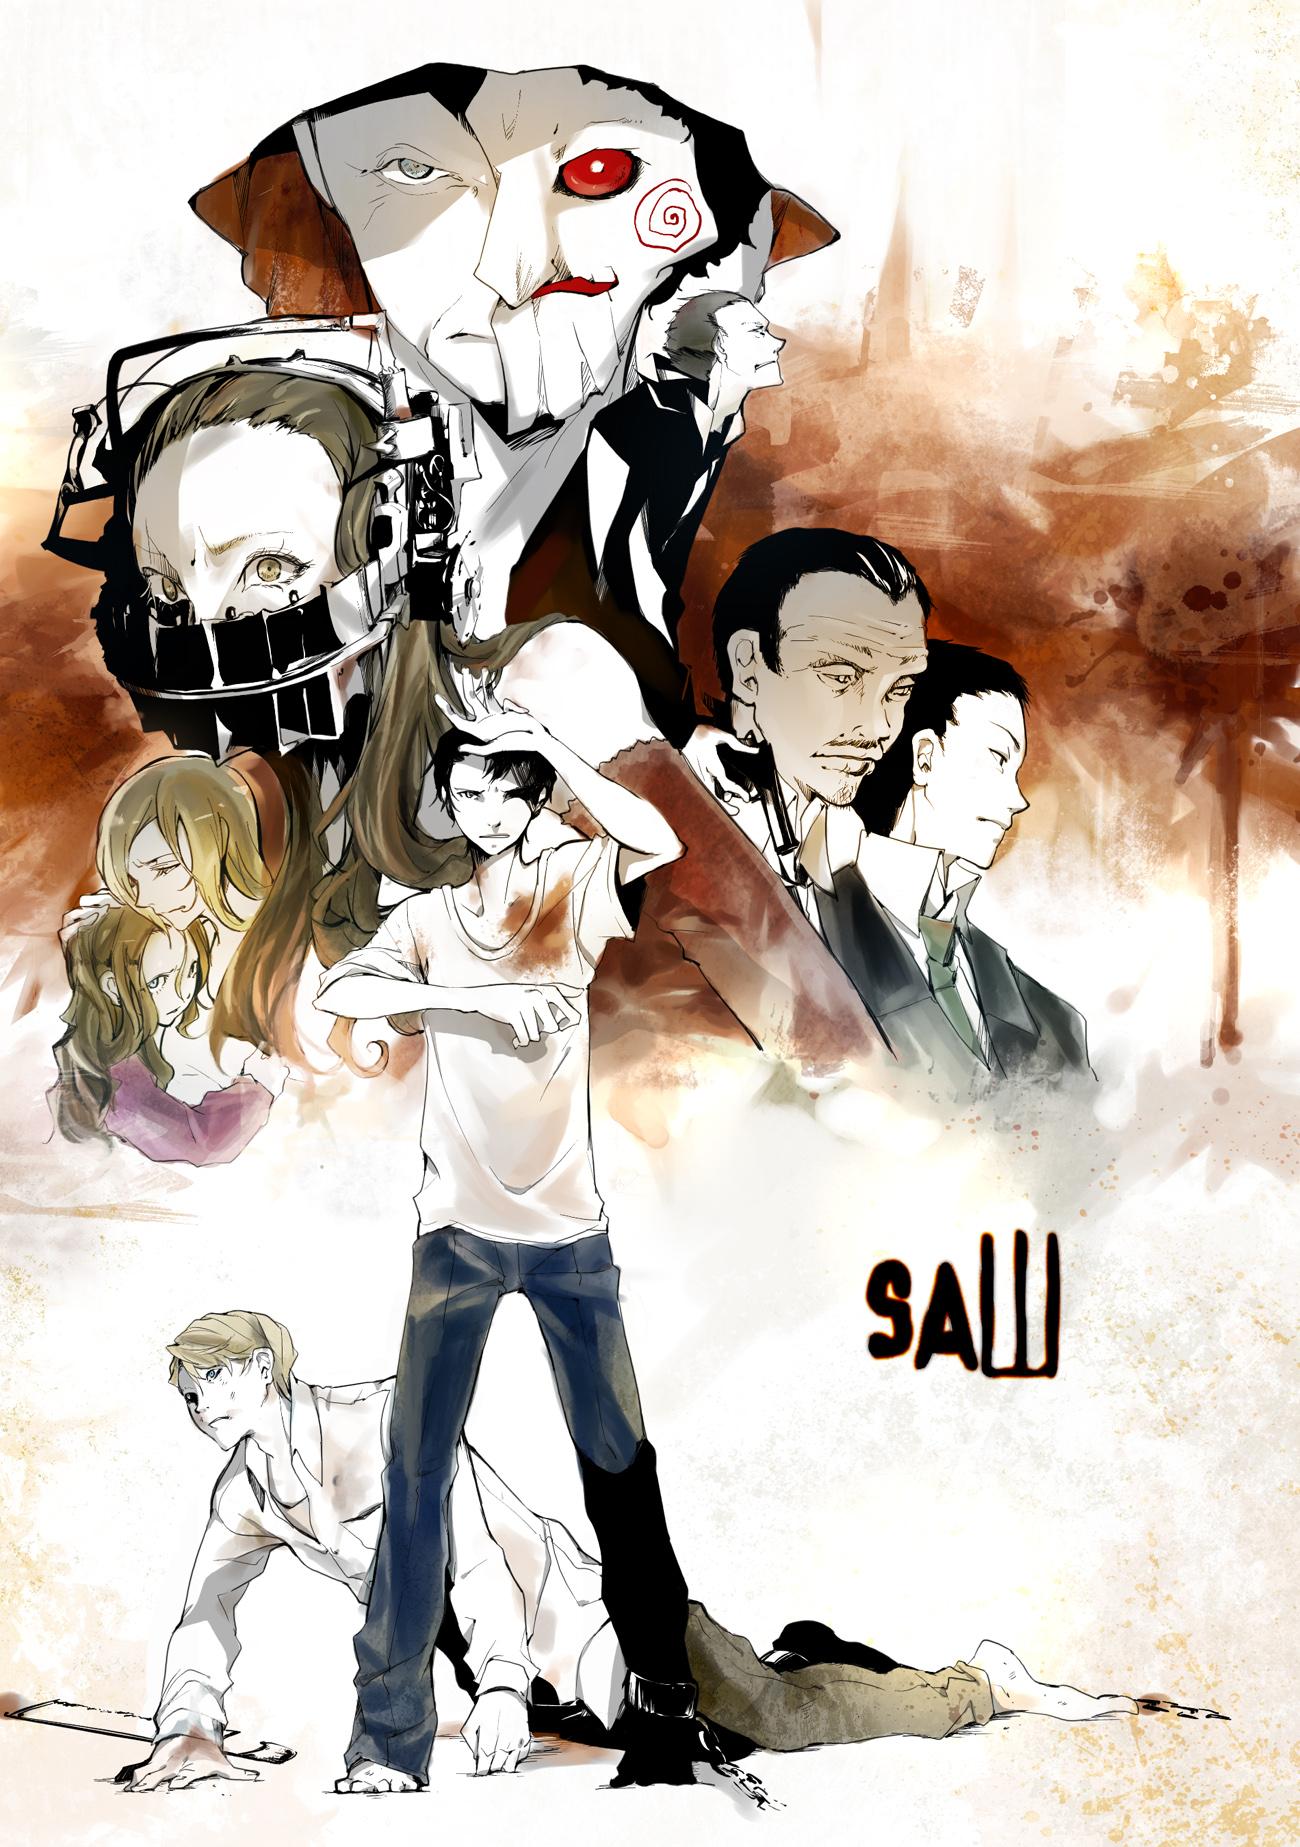 John Kramer (Jigsaw) - Saw (Movie) - Zerochan Anime Image Board